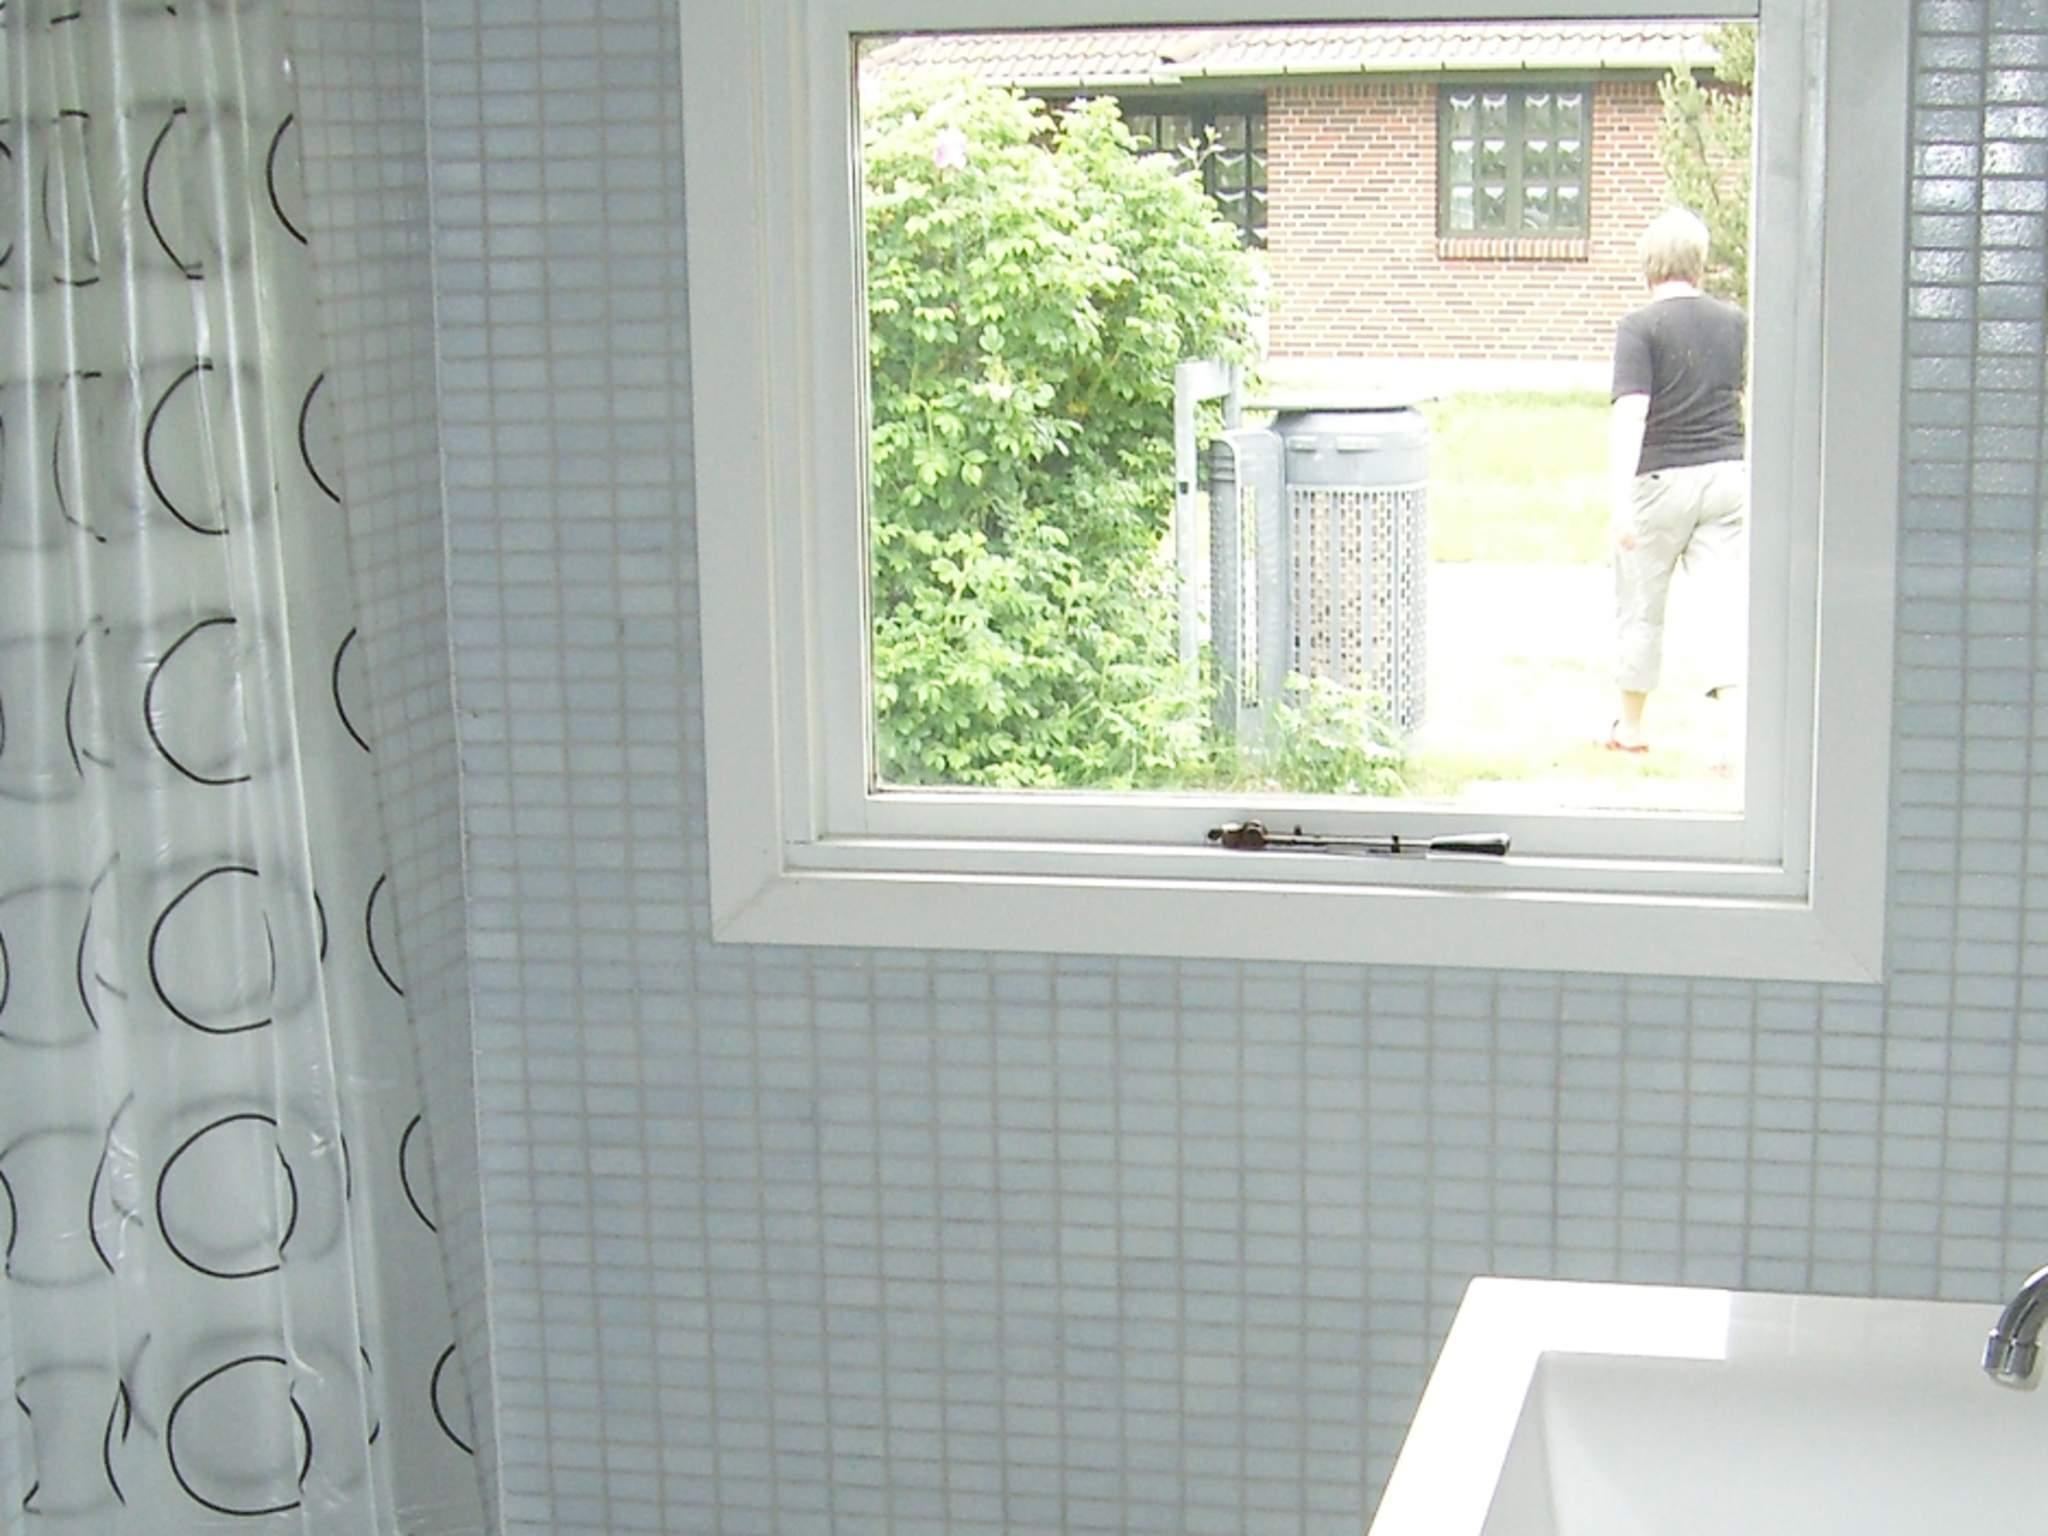 Maison de vacances Kramnitze (87258), Kramnitse, , Lolland, Danemark, image 11